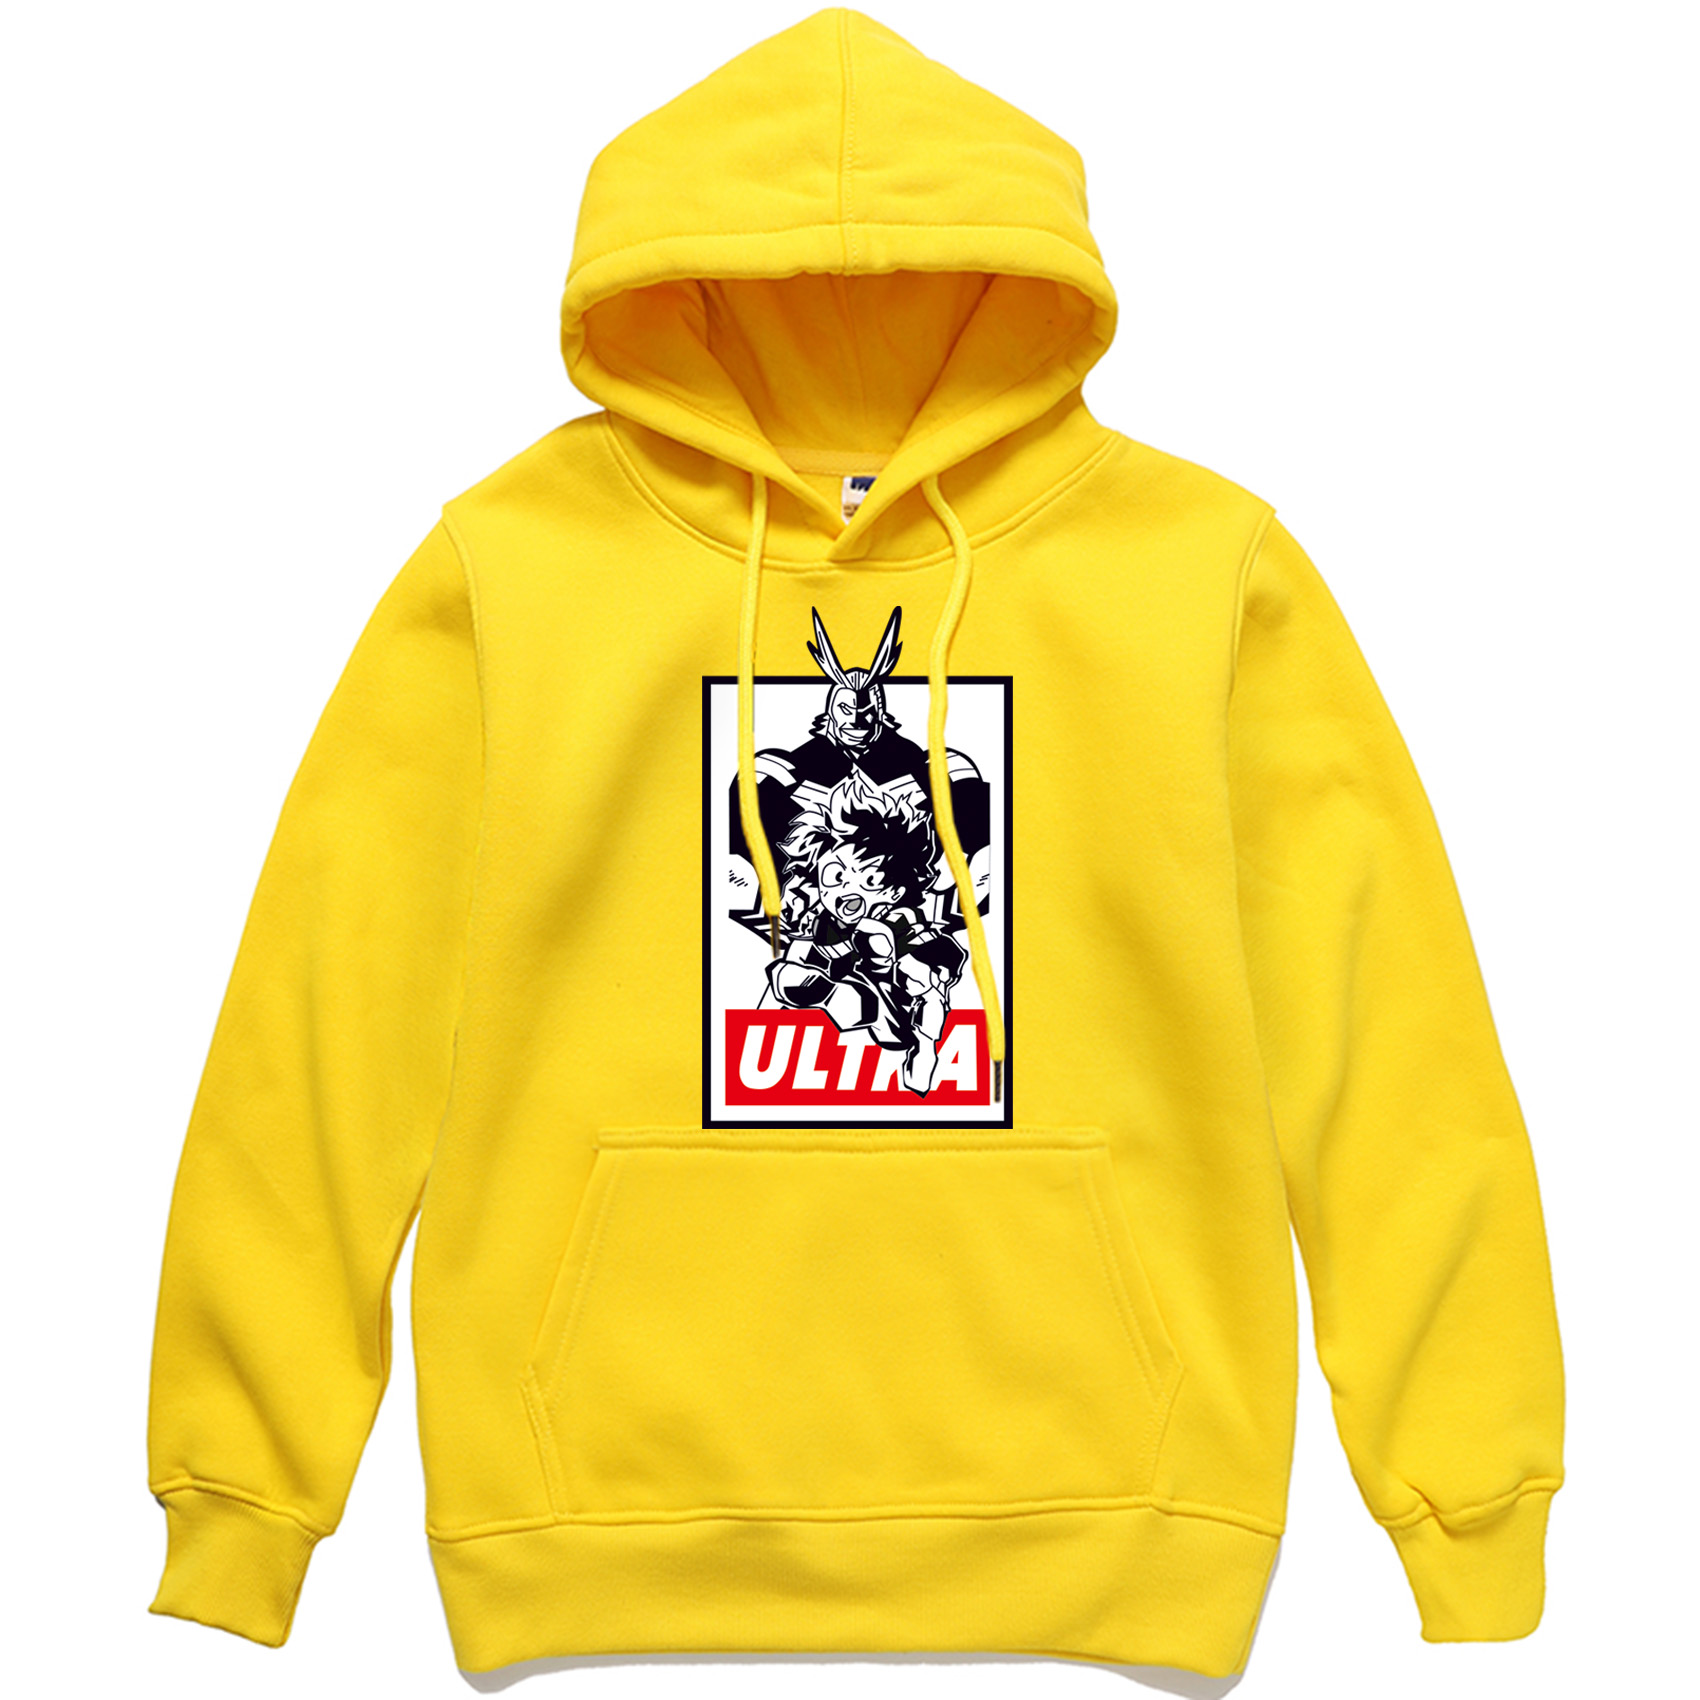 2019 New Arrival Men Hoodies My Hero Academia All Might Midoriya Izuku Pullover Male Hip Hop Streetwear Hoody Hipster Tracksuit